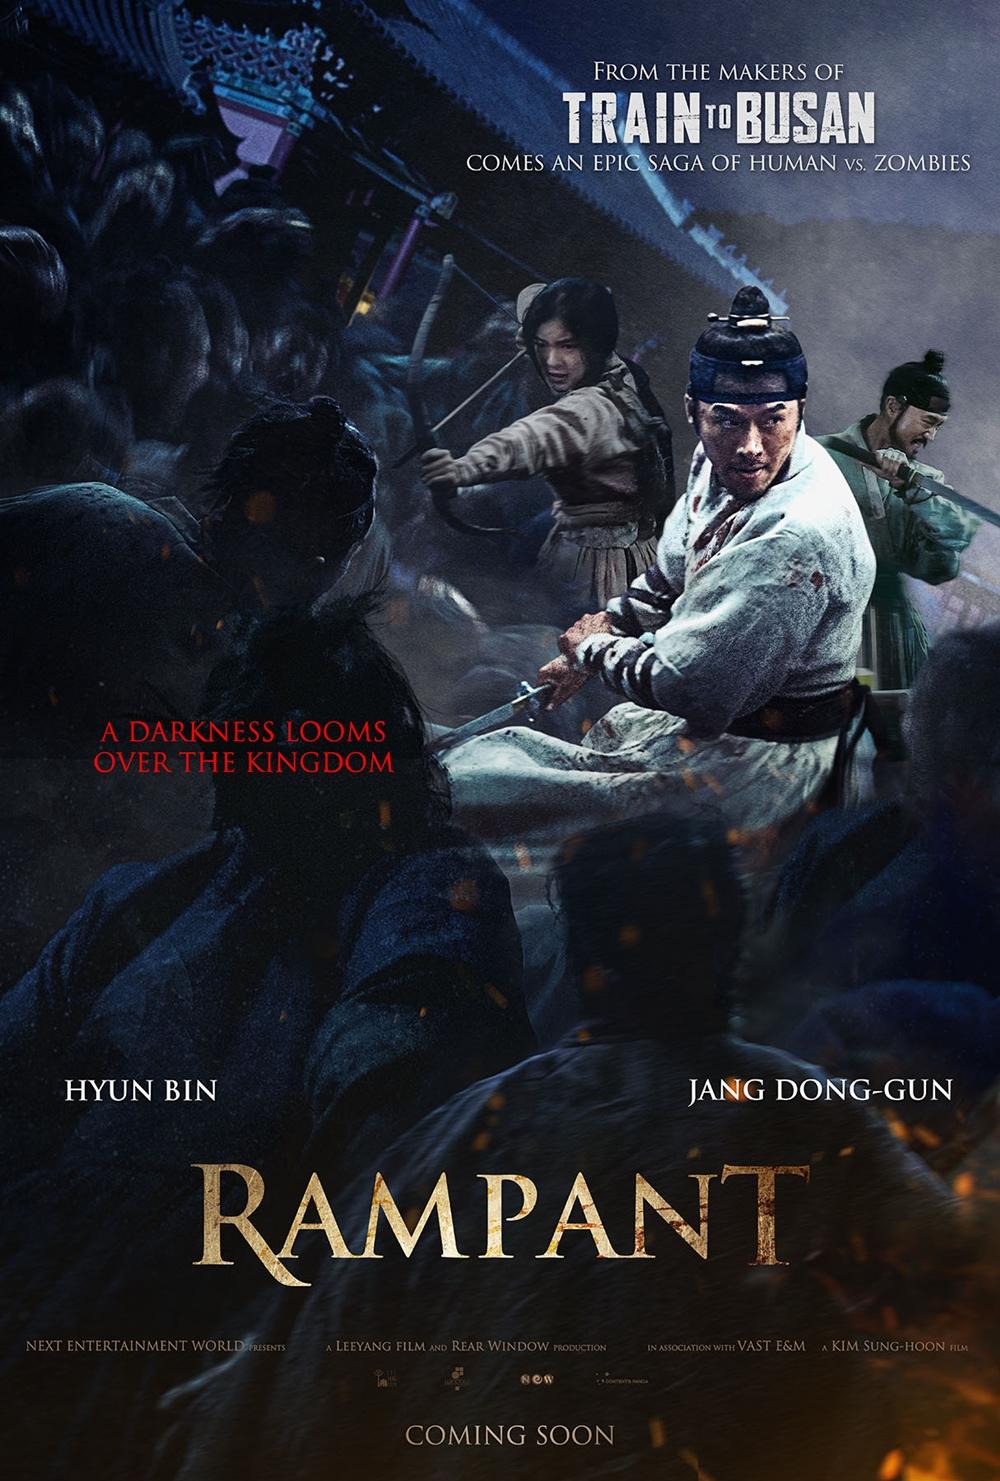 RAMPANT POSTER 1